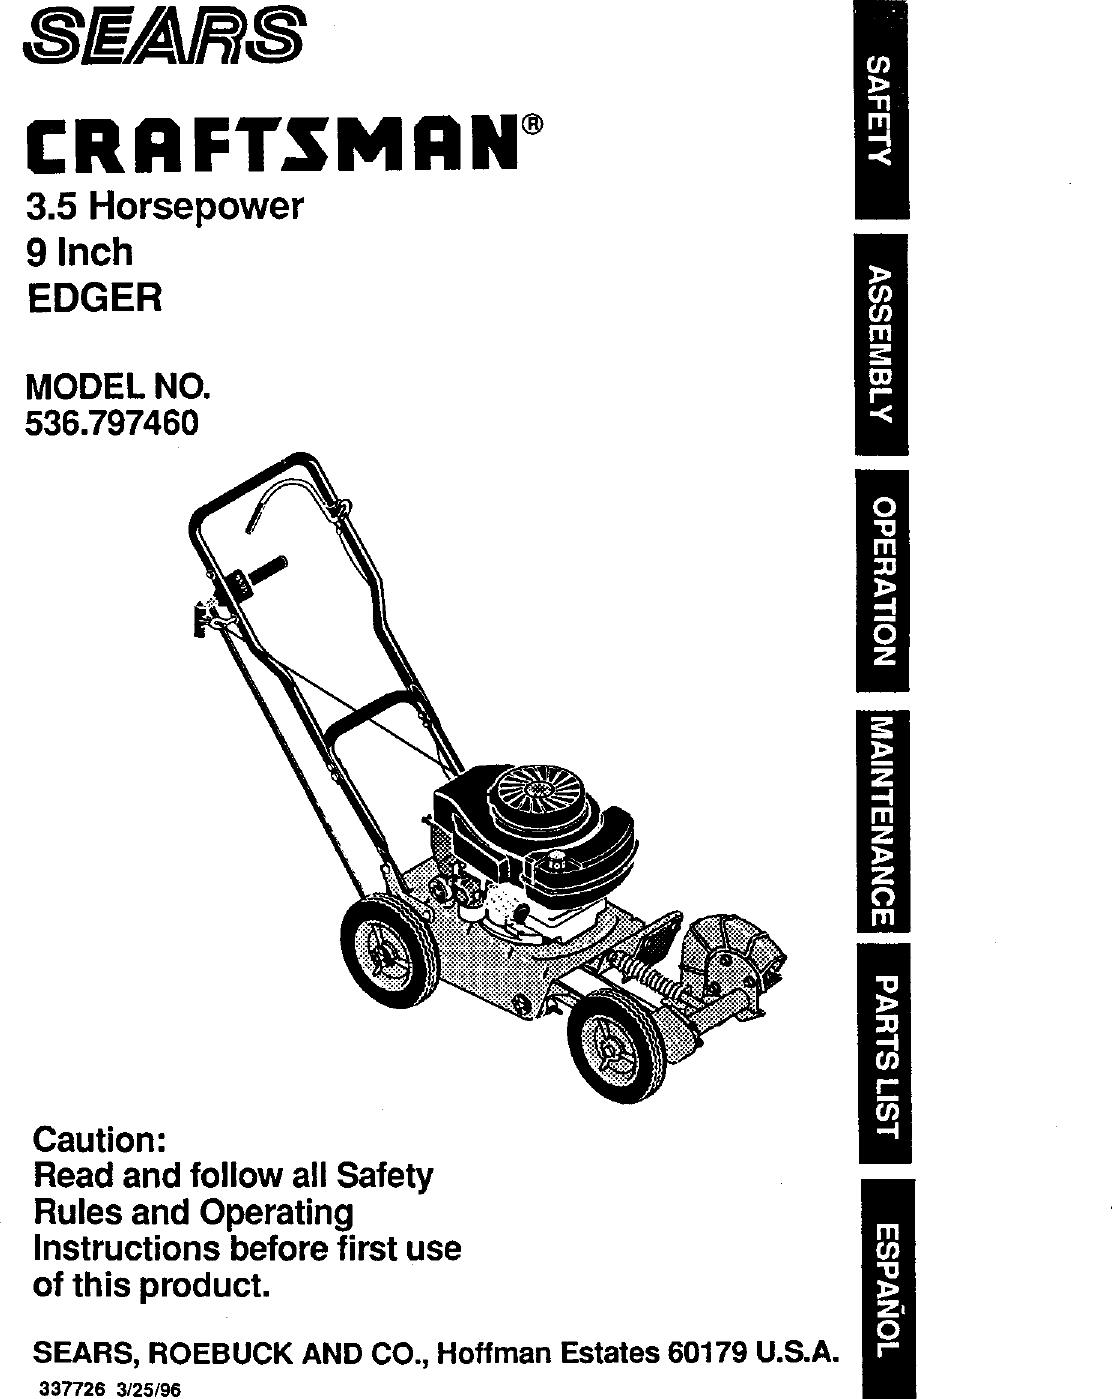 Craftsman 536797460 User Manual 3 5 HP 9 EDGER Manuals And